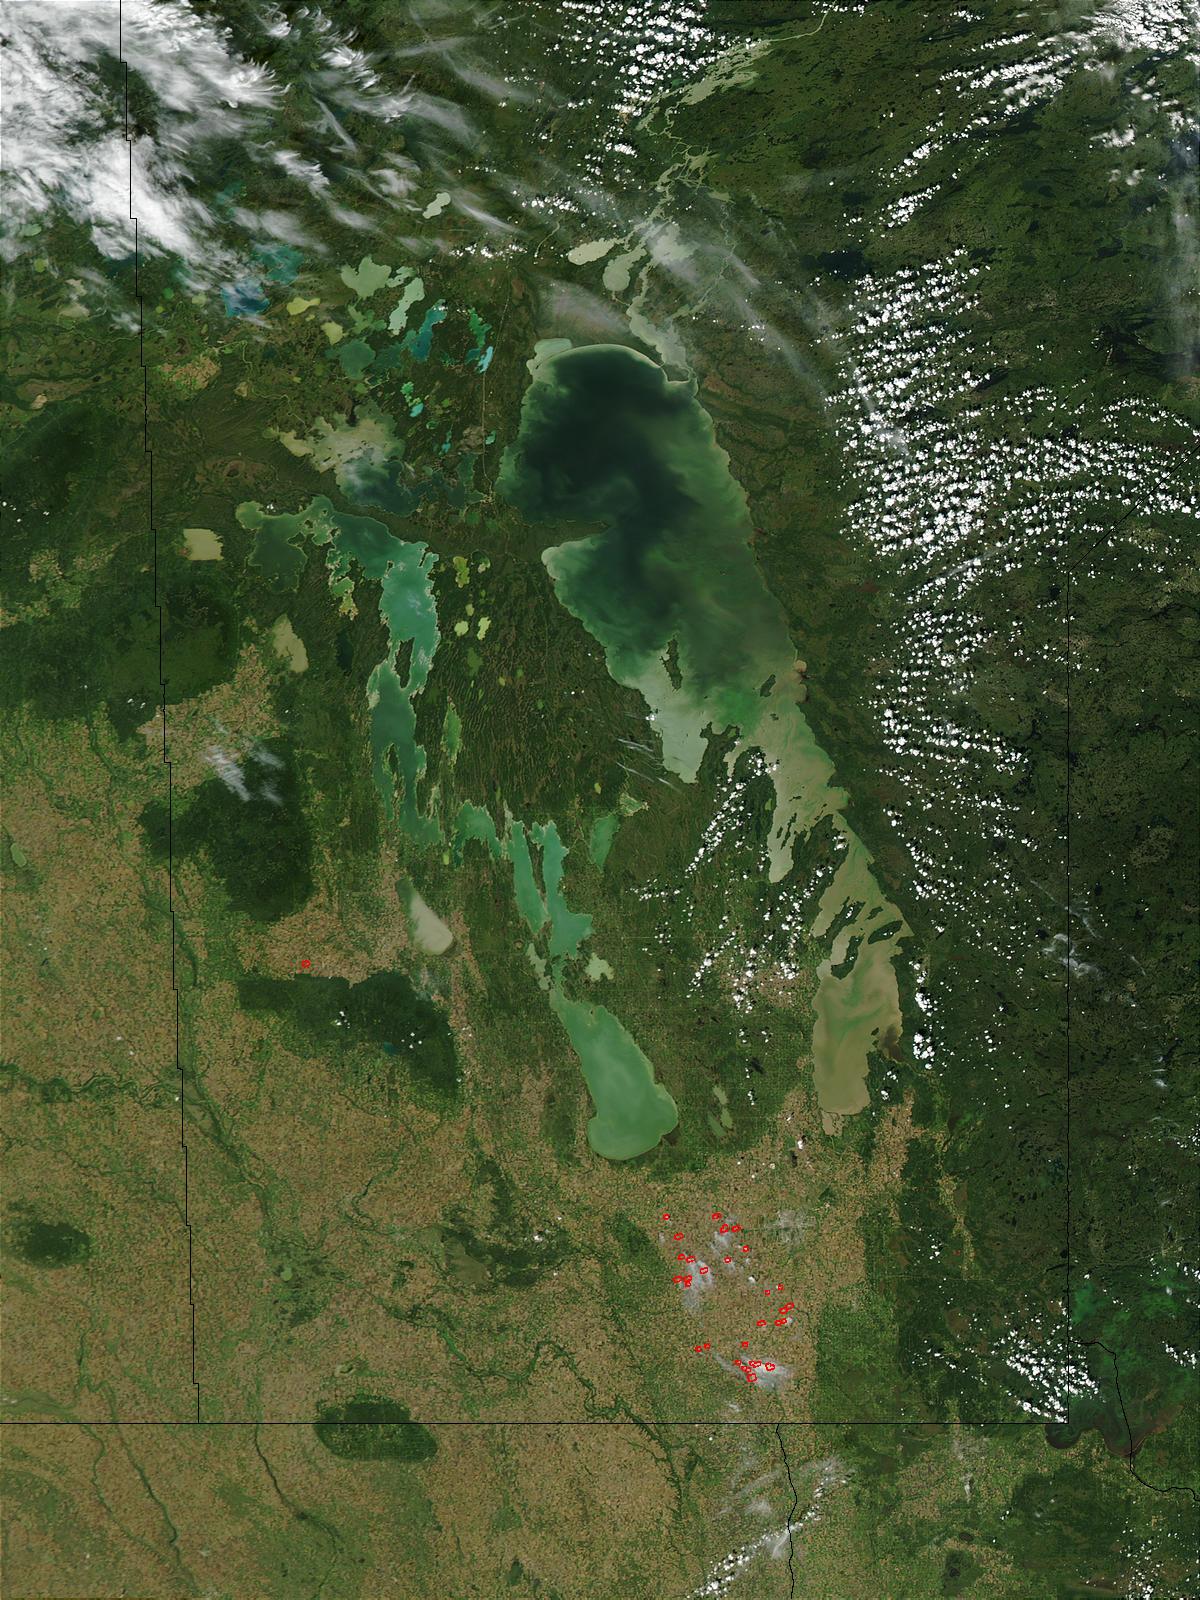 Lake Winnipeg, Manitoba, Canada - related image preview